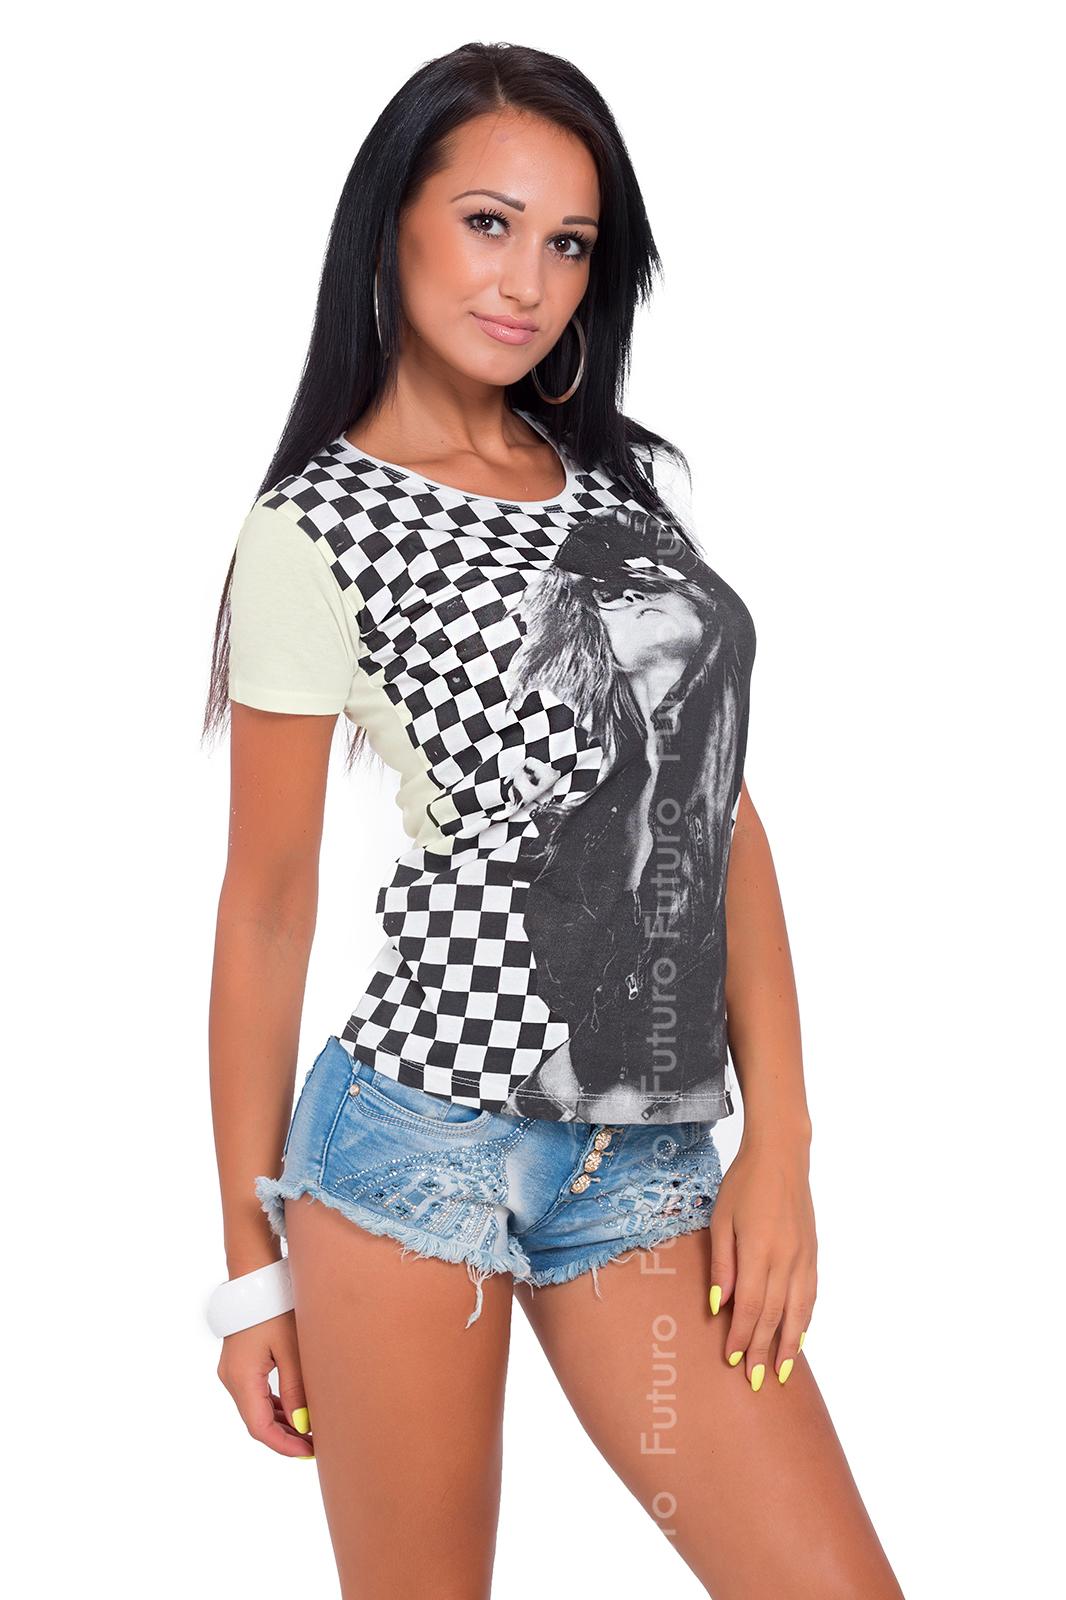 Women/'s Top Trendy Print Scoop Neck Short Sleeve Cotton T-Shirt Sizes 8-14 B02